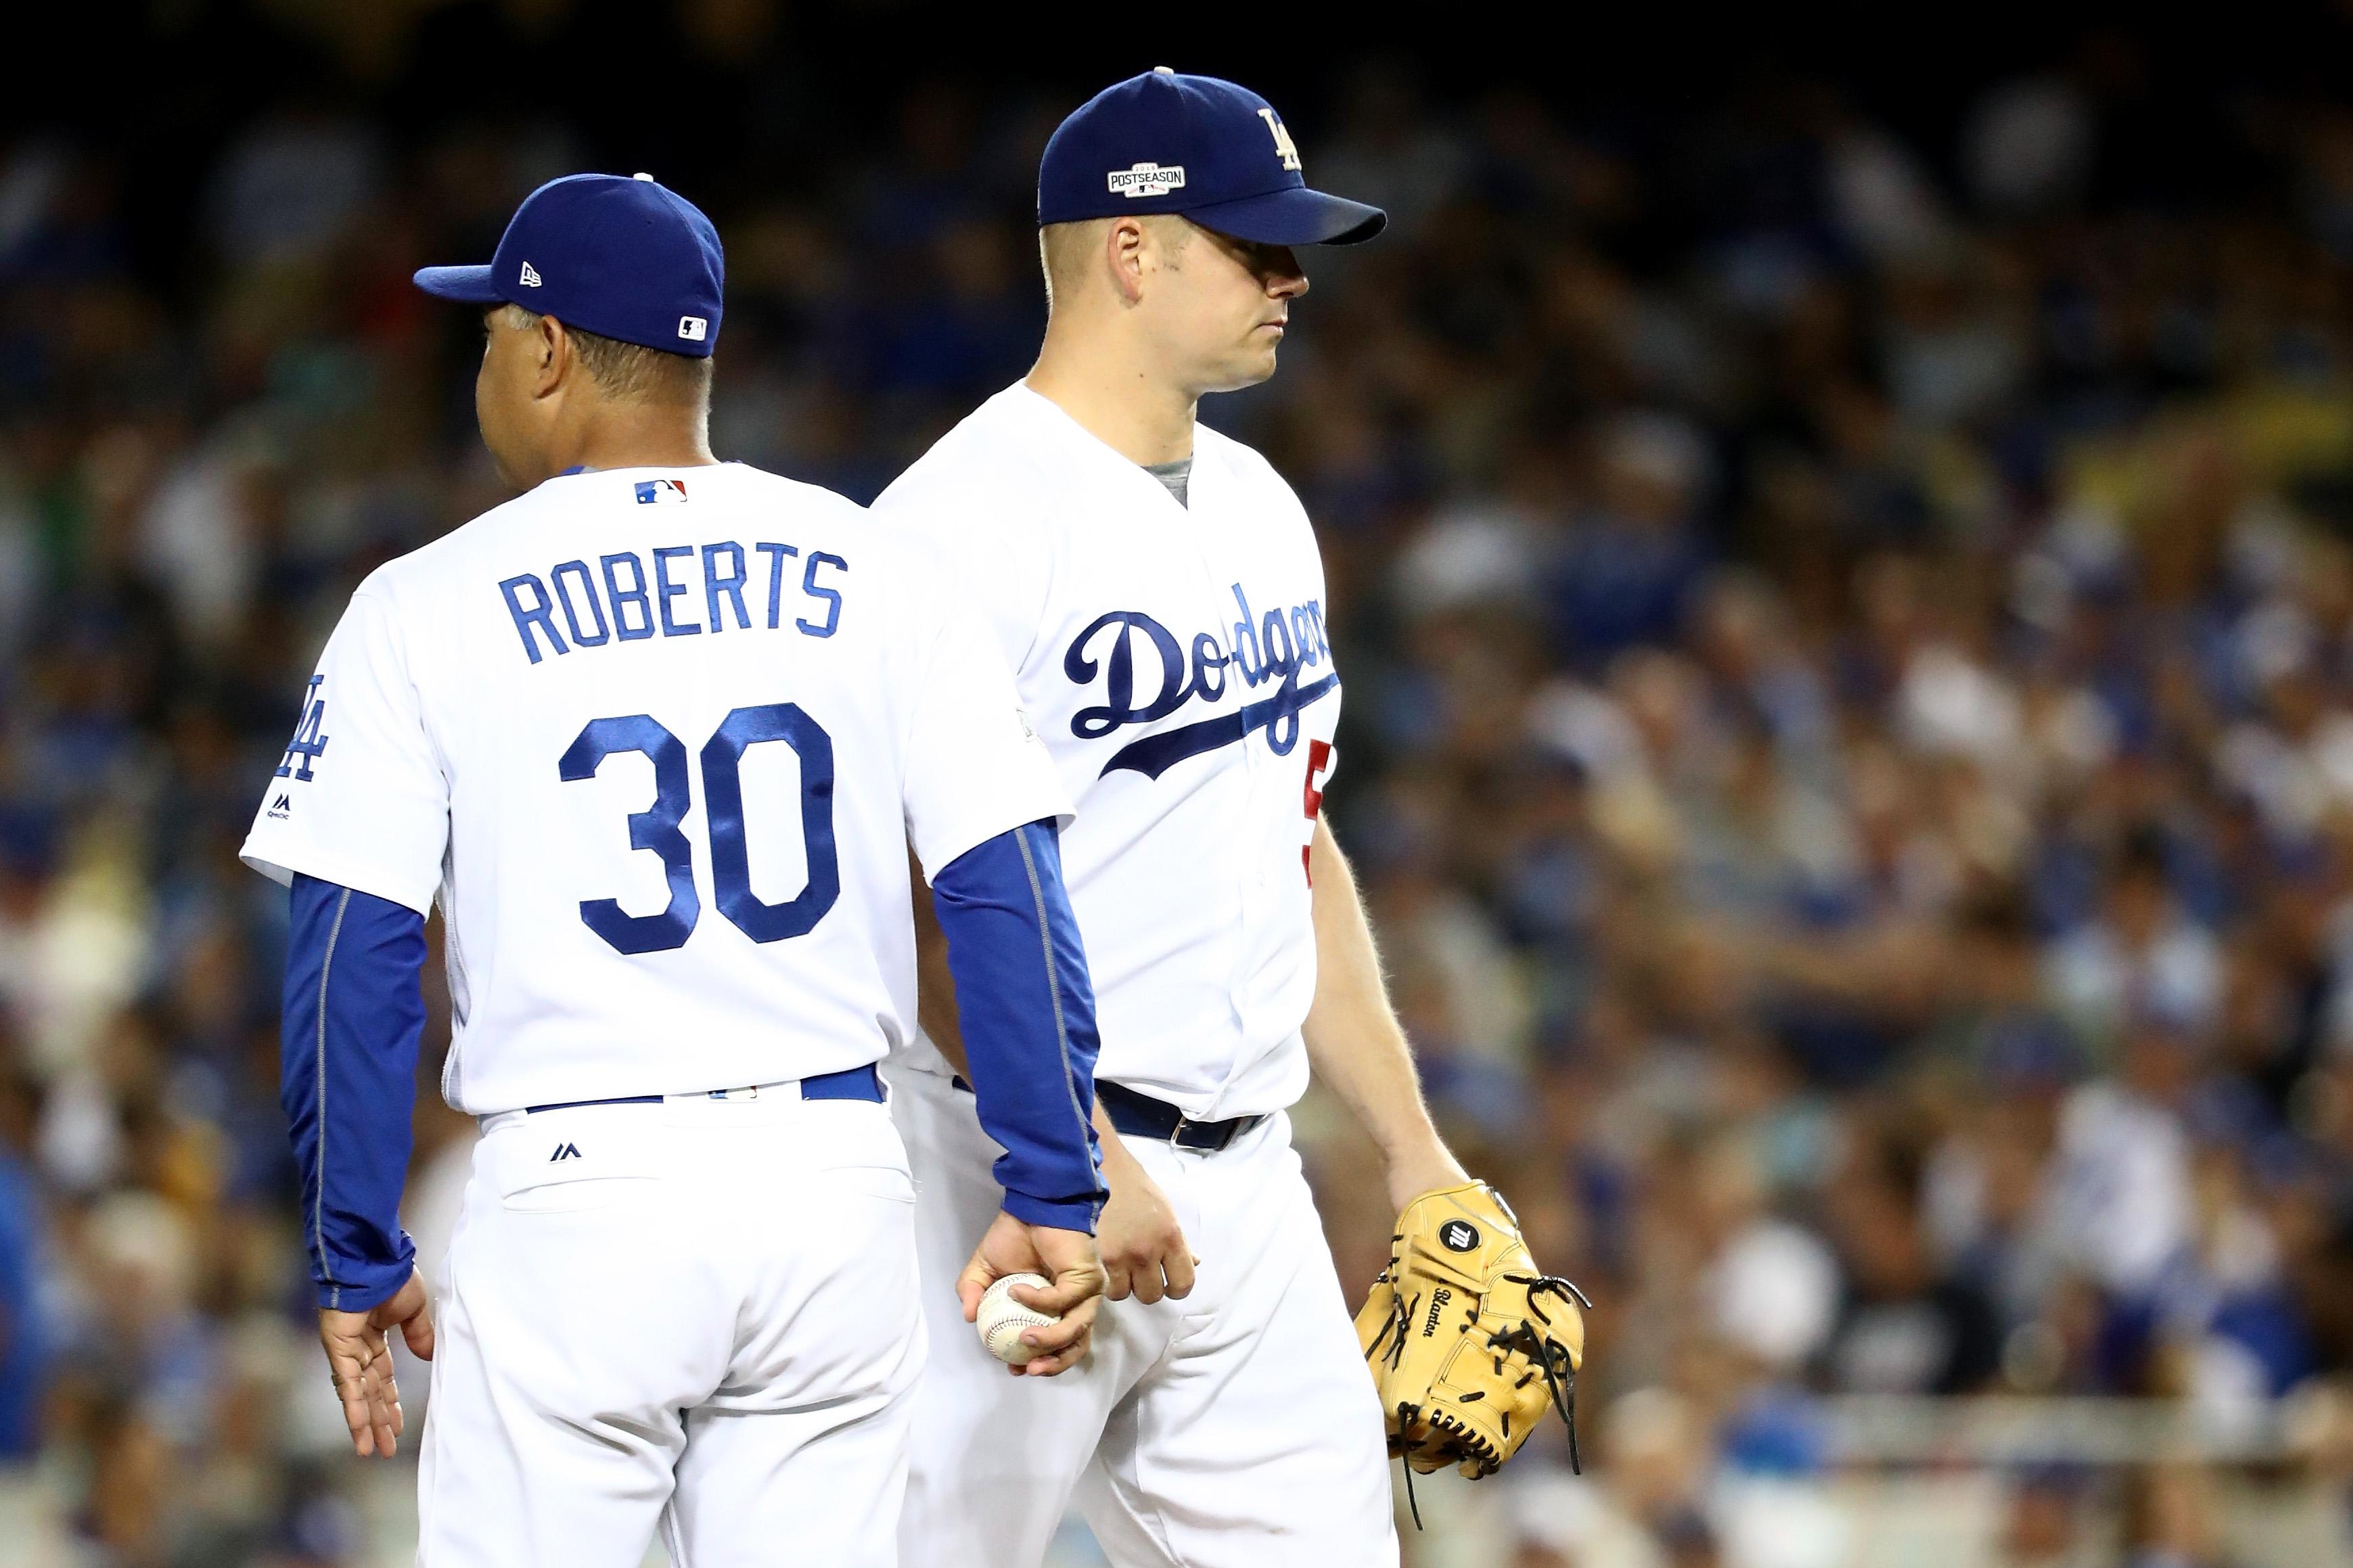 NLCS - Chicago Cubs v Los Angeles Dodgers - Game Five